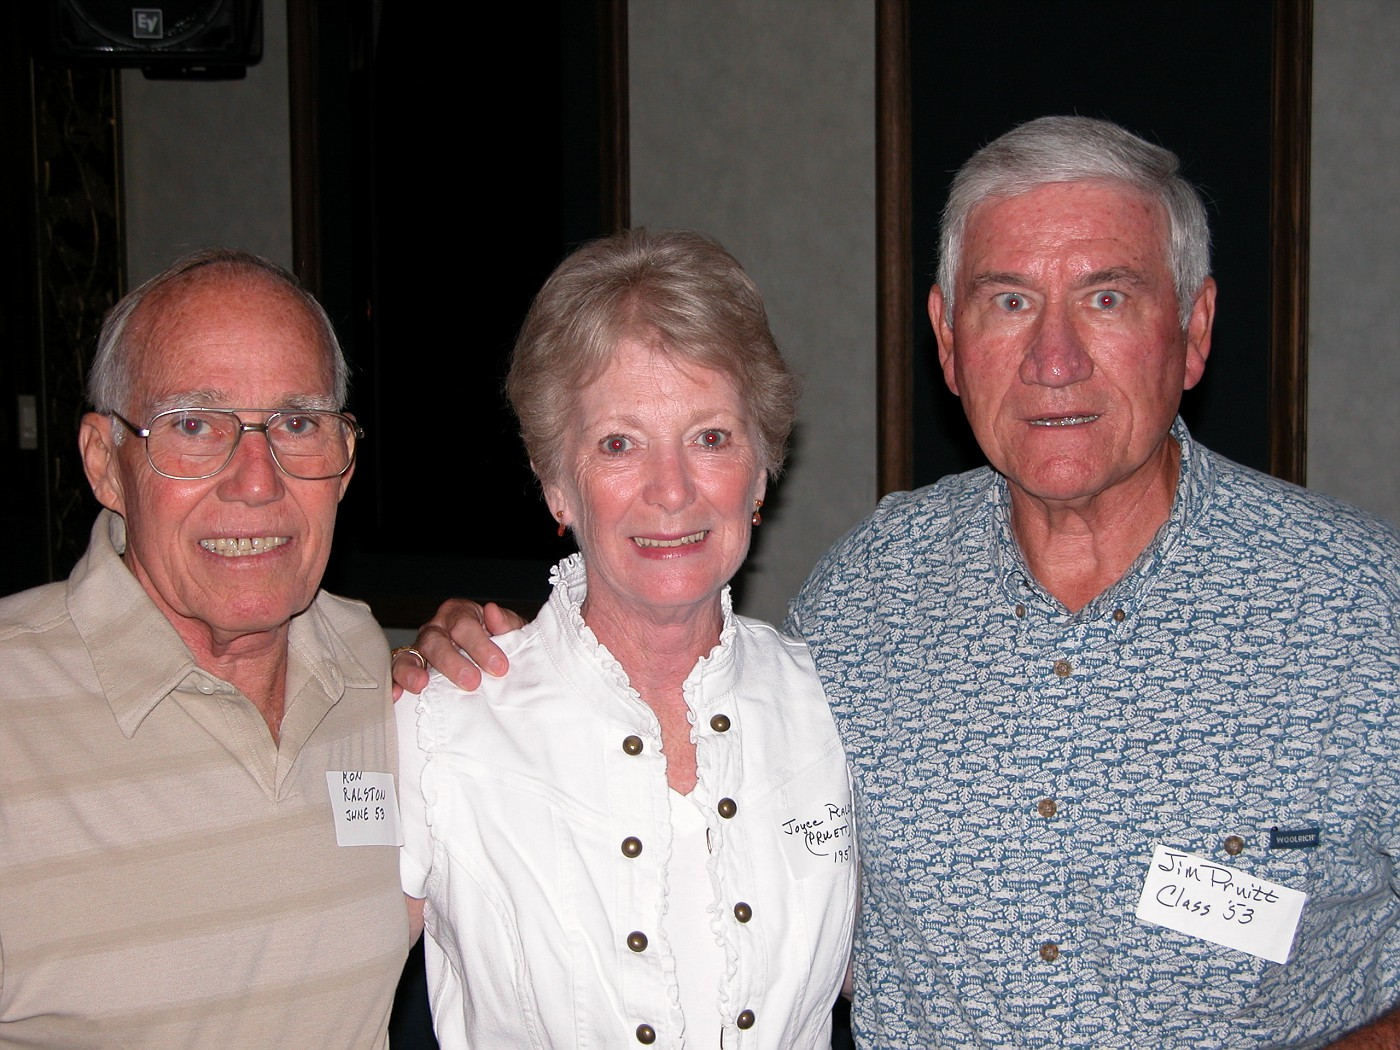 Ron & Joyce Ralston, Jim Pruitt